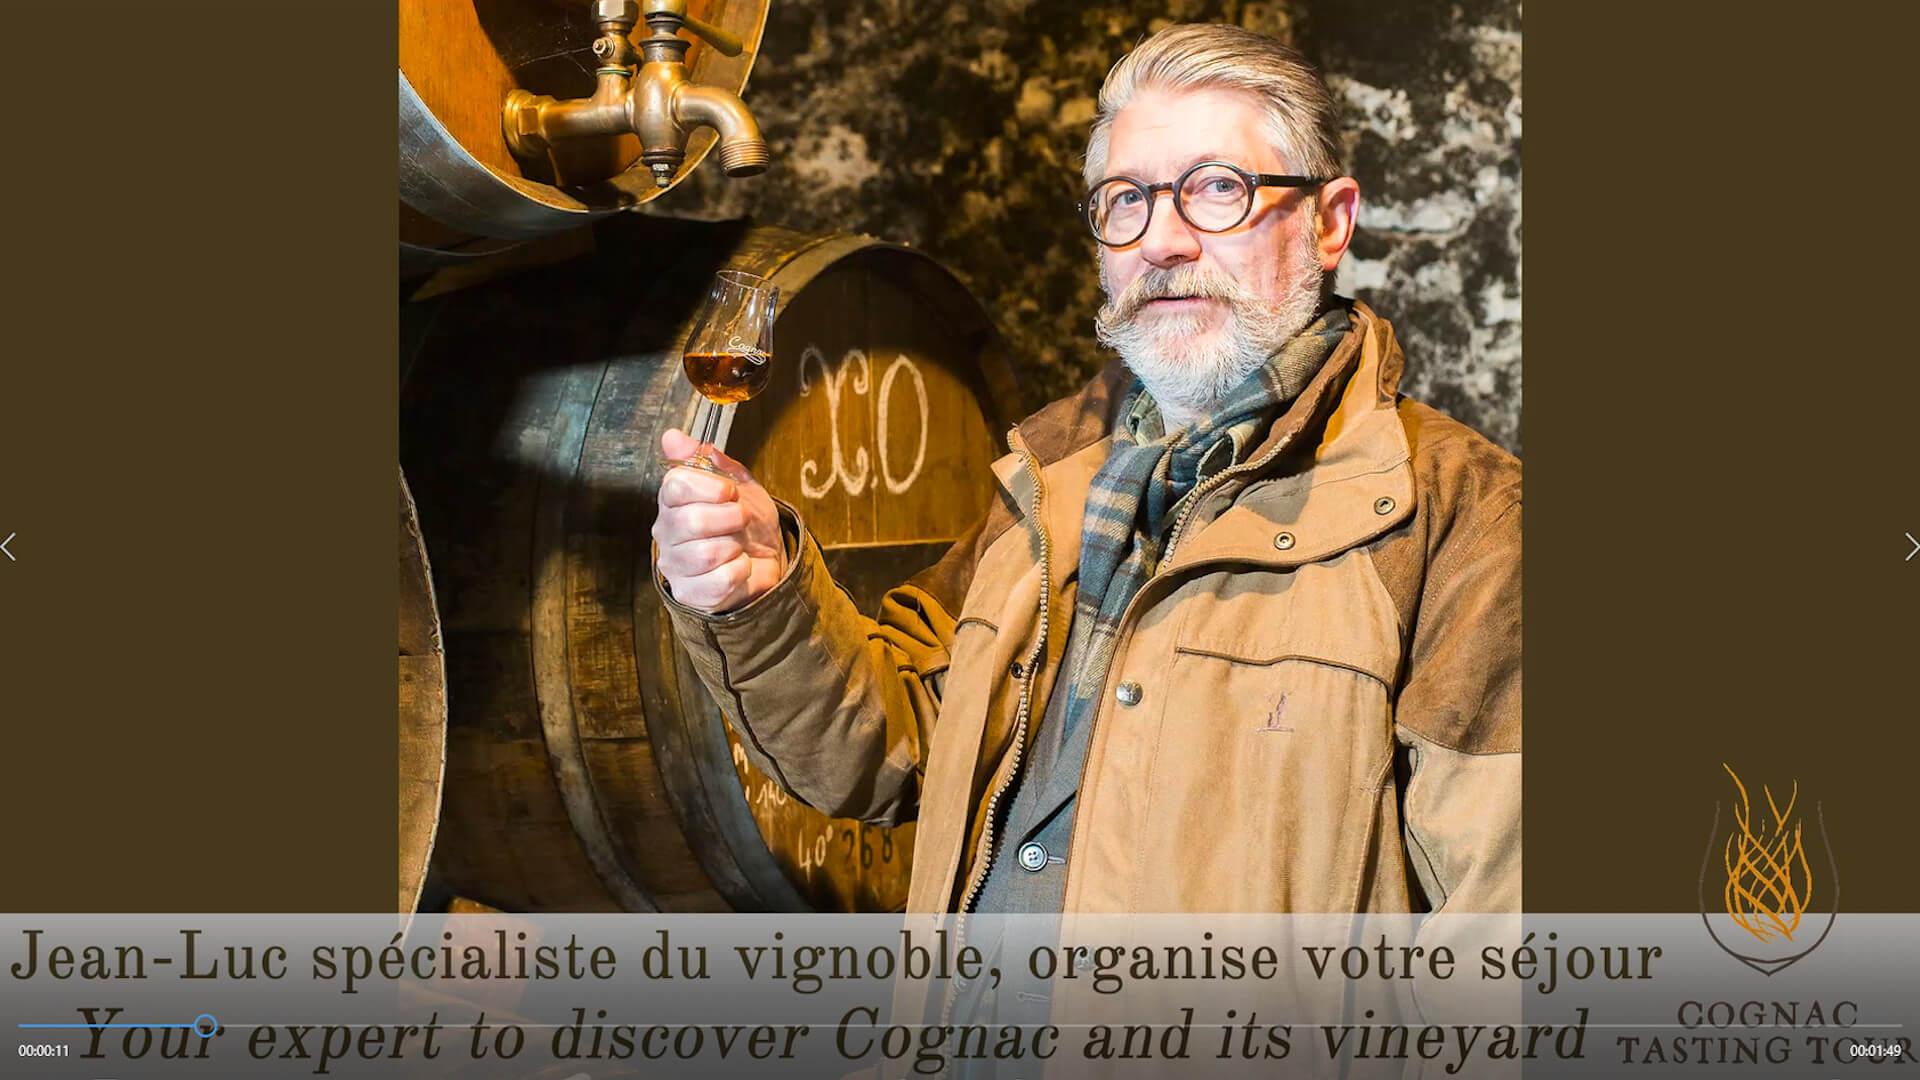 Video presentation of Cognac Tasting Tour on Youtube